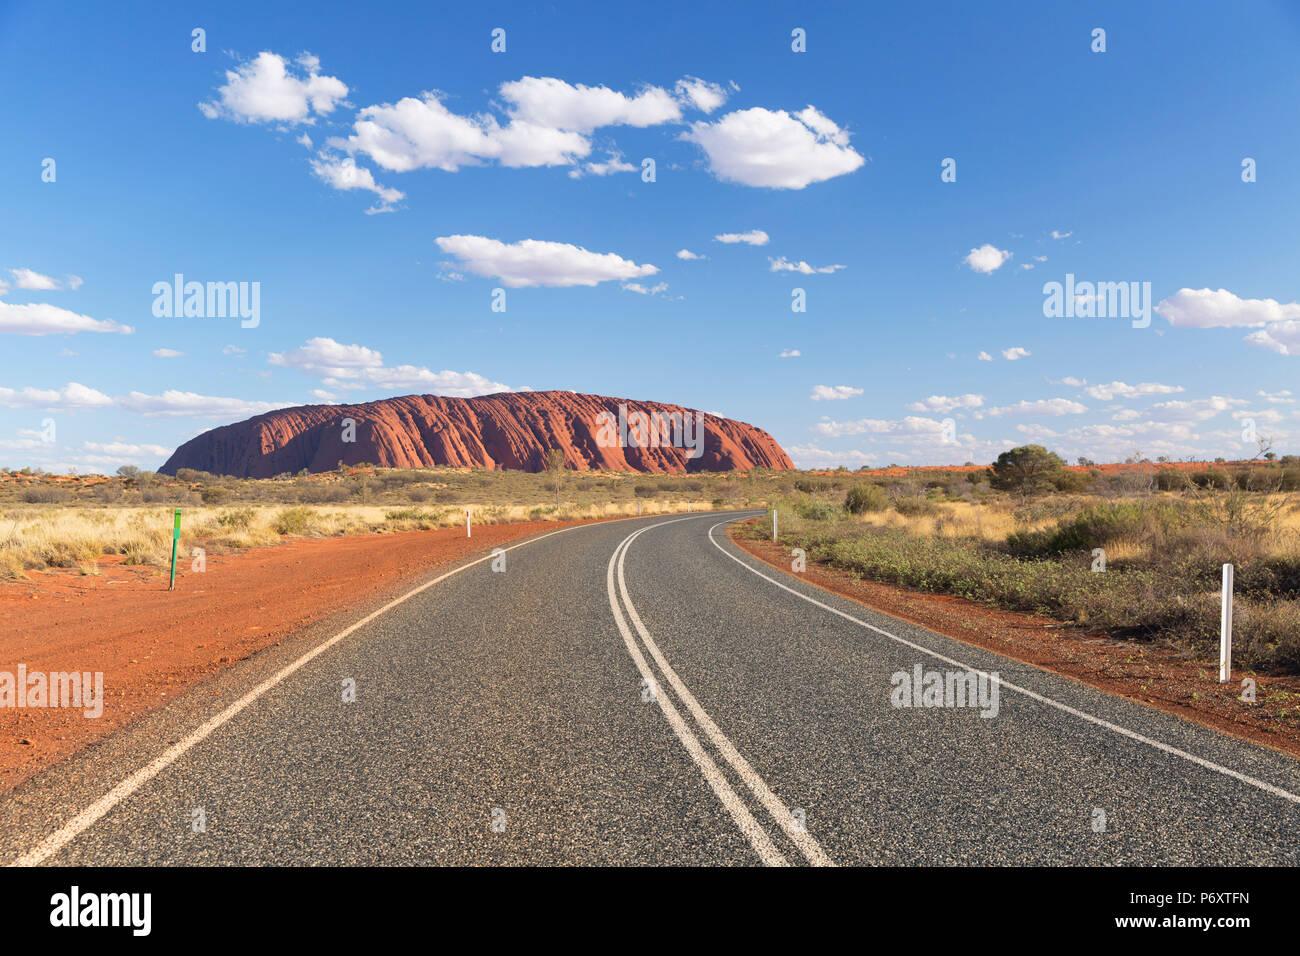 Uluru (UNESCO-Weltkulturerbe), Uluru-Kata Tjuta National Park, Northern Territory, Australien Stockbild